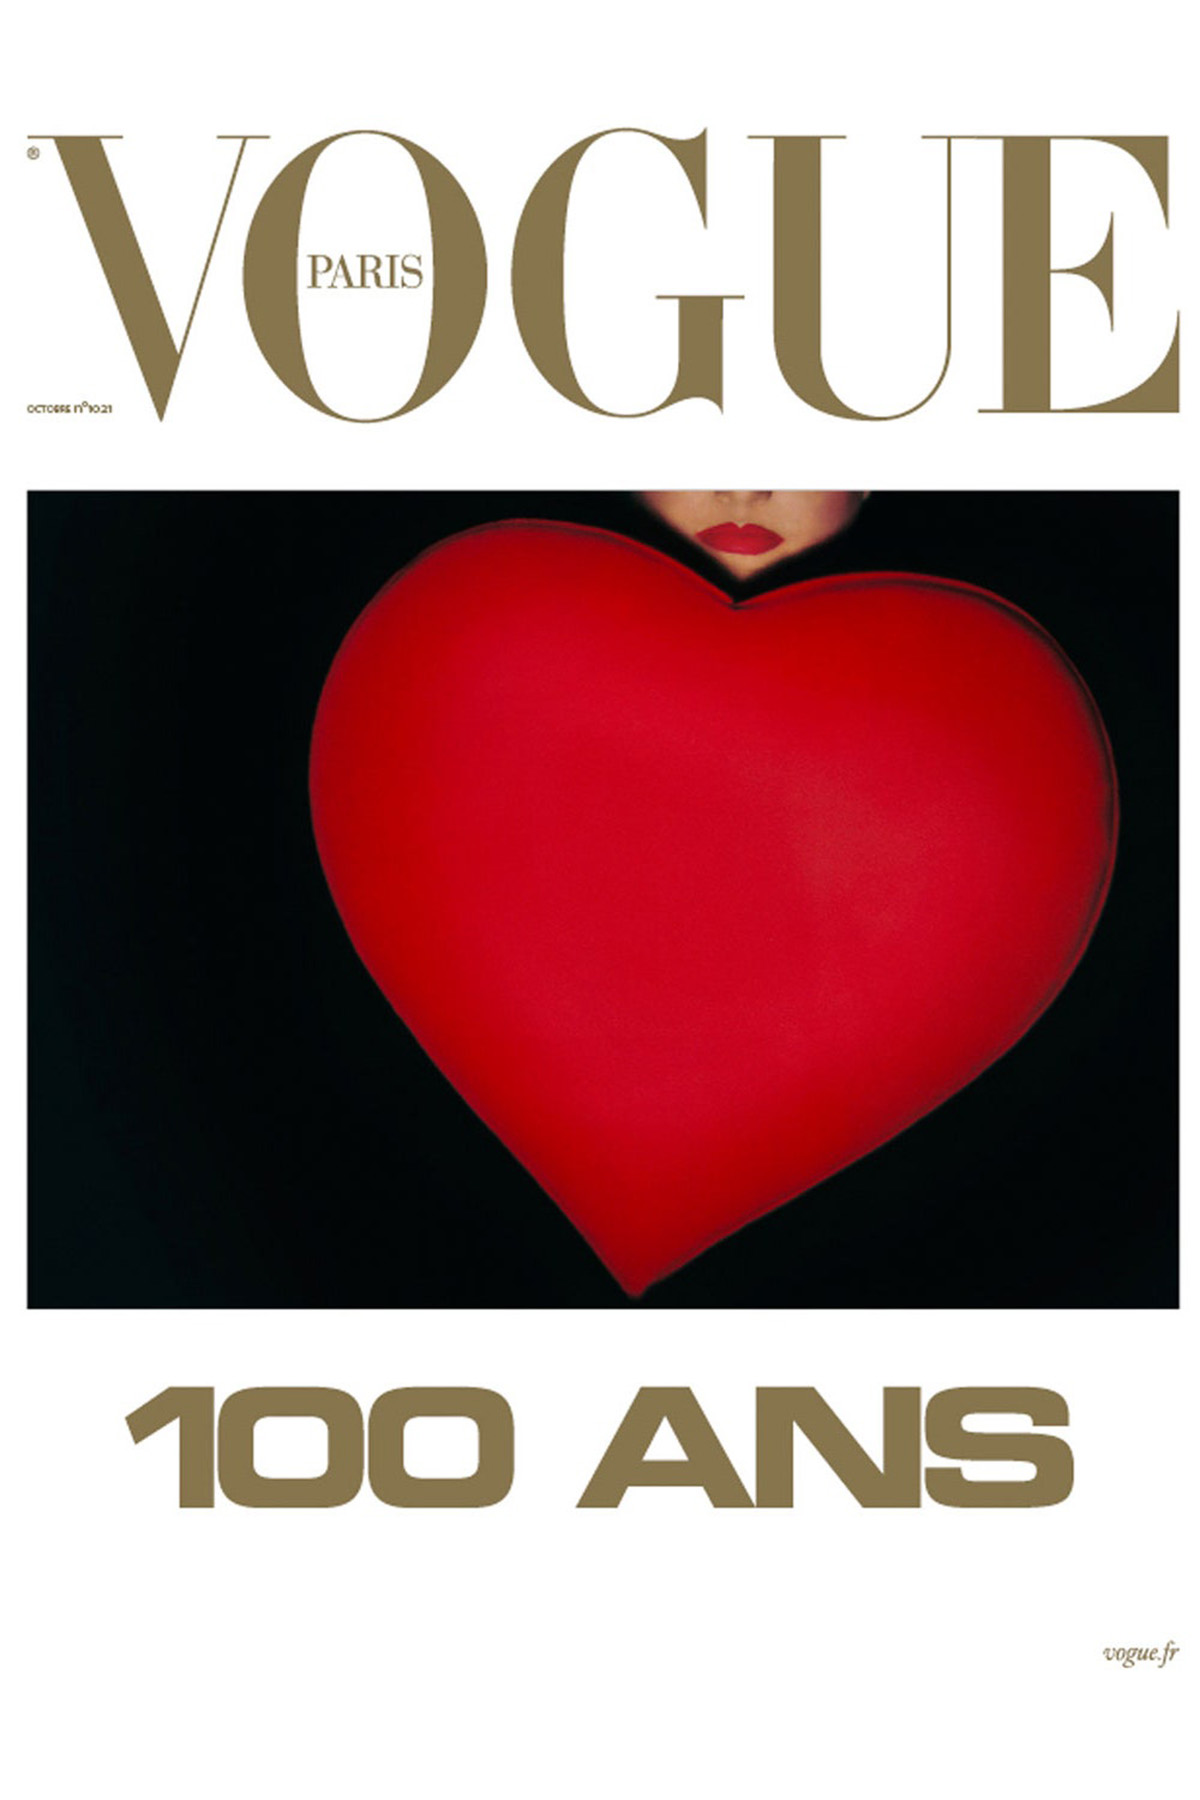 Vogue Paris October 2021 cover by Guy Bourdin